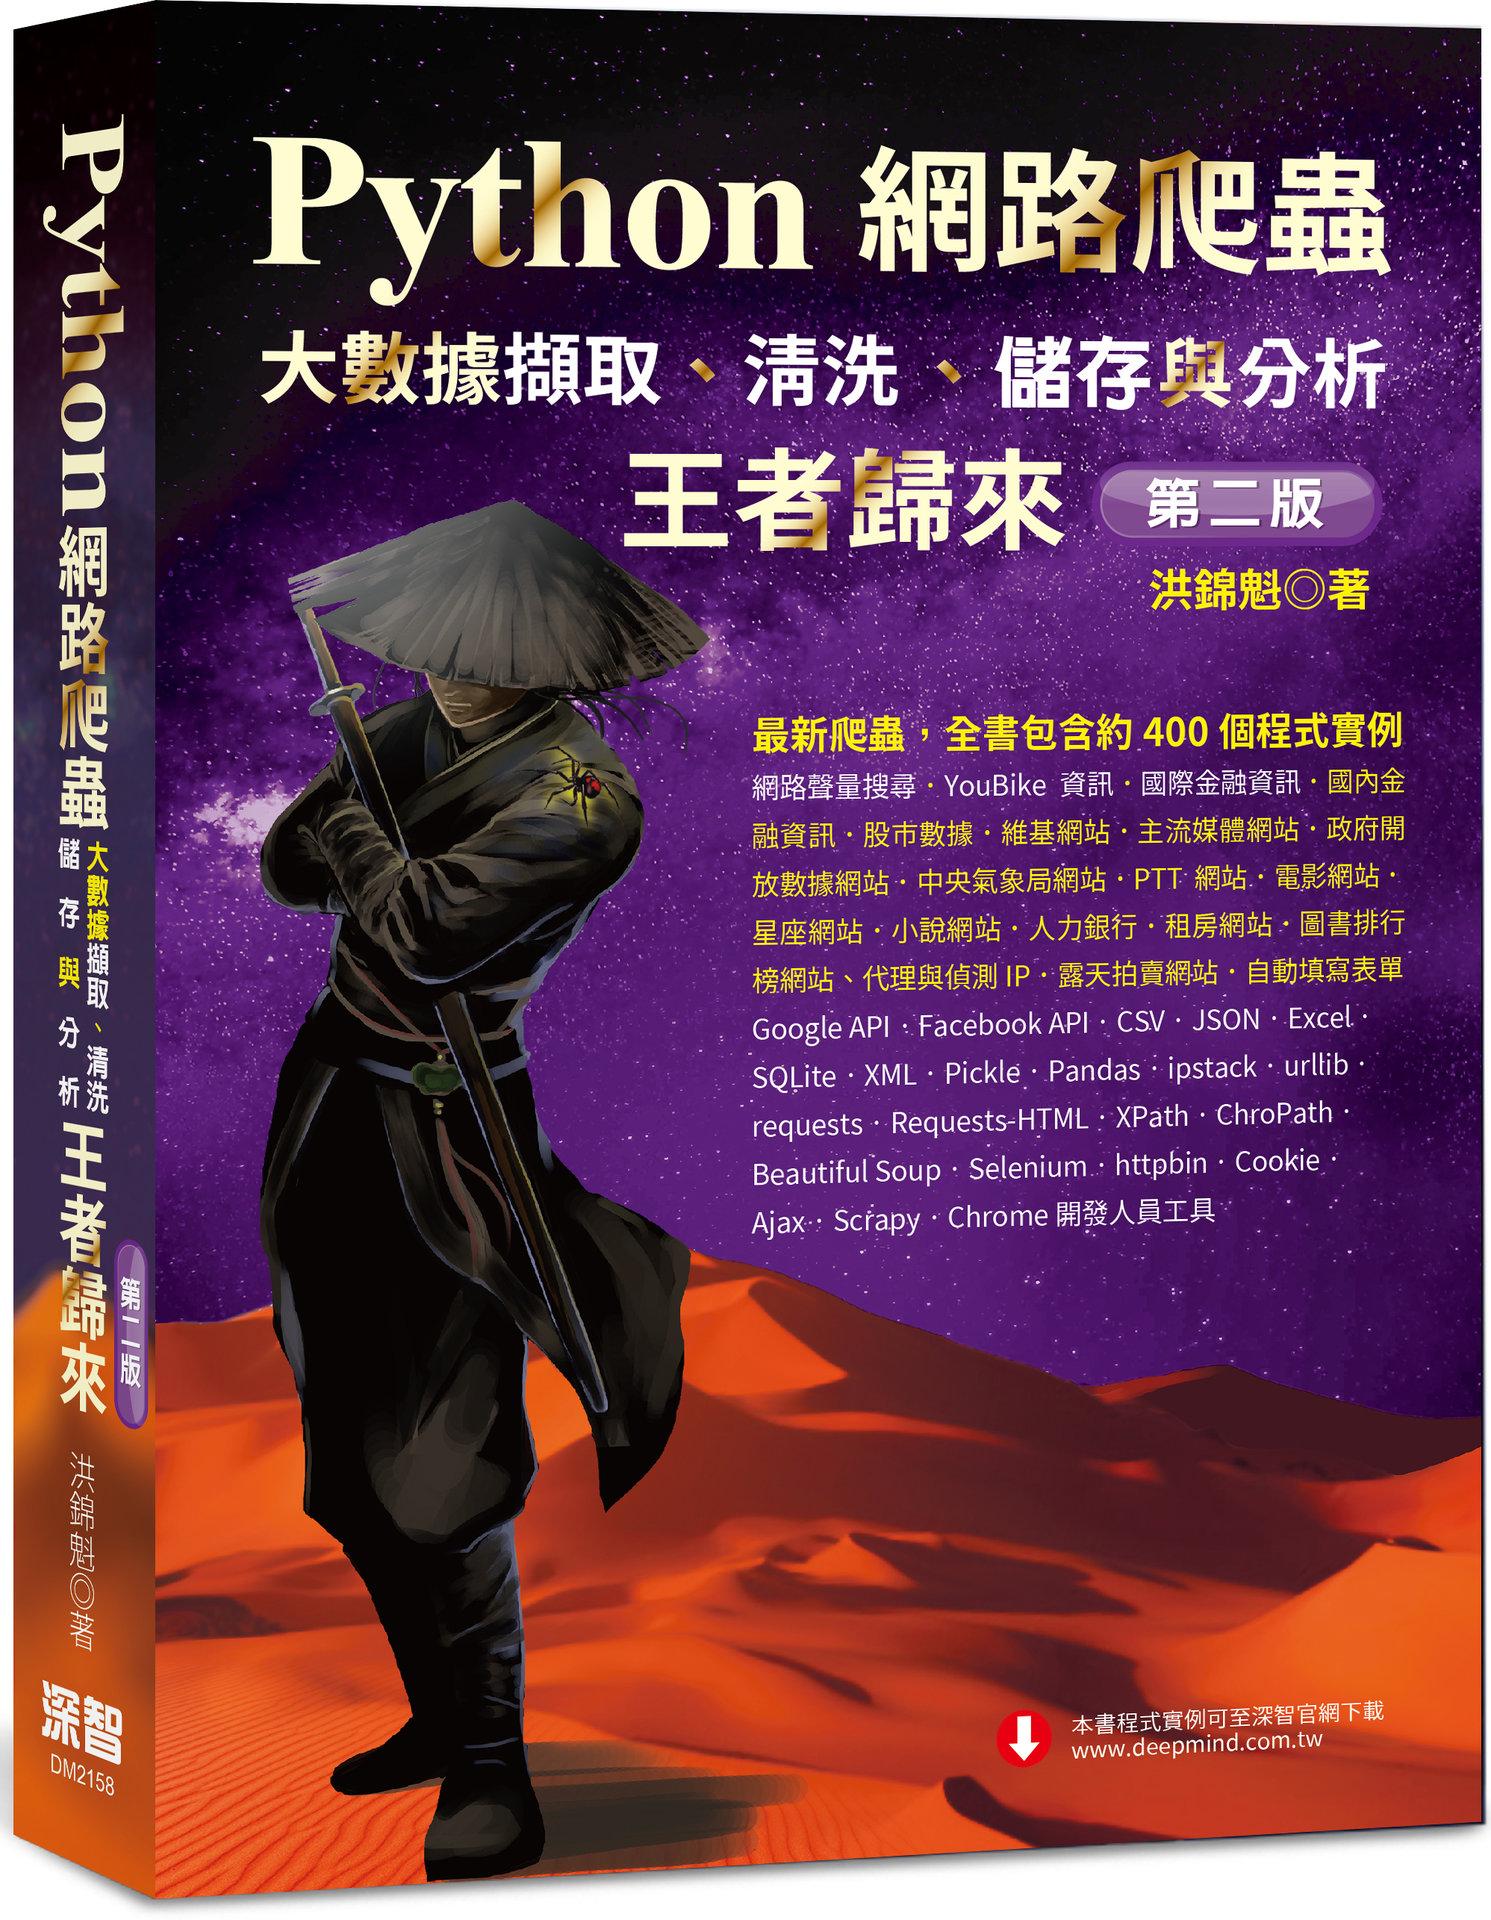 Python 網路爬蟲:大數據擷取、清洗、儲存與分析 王者歸來 (第二版)-preview-1